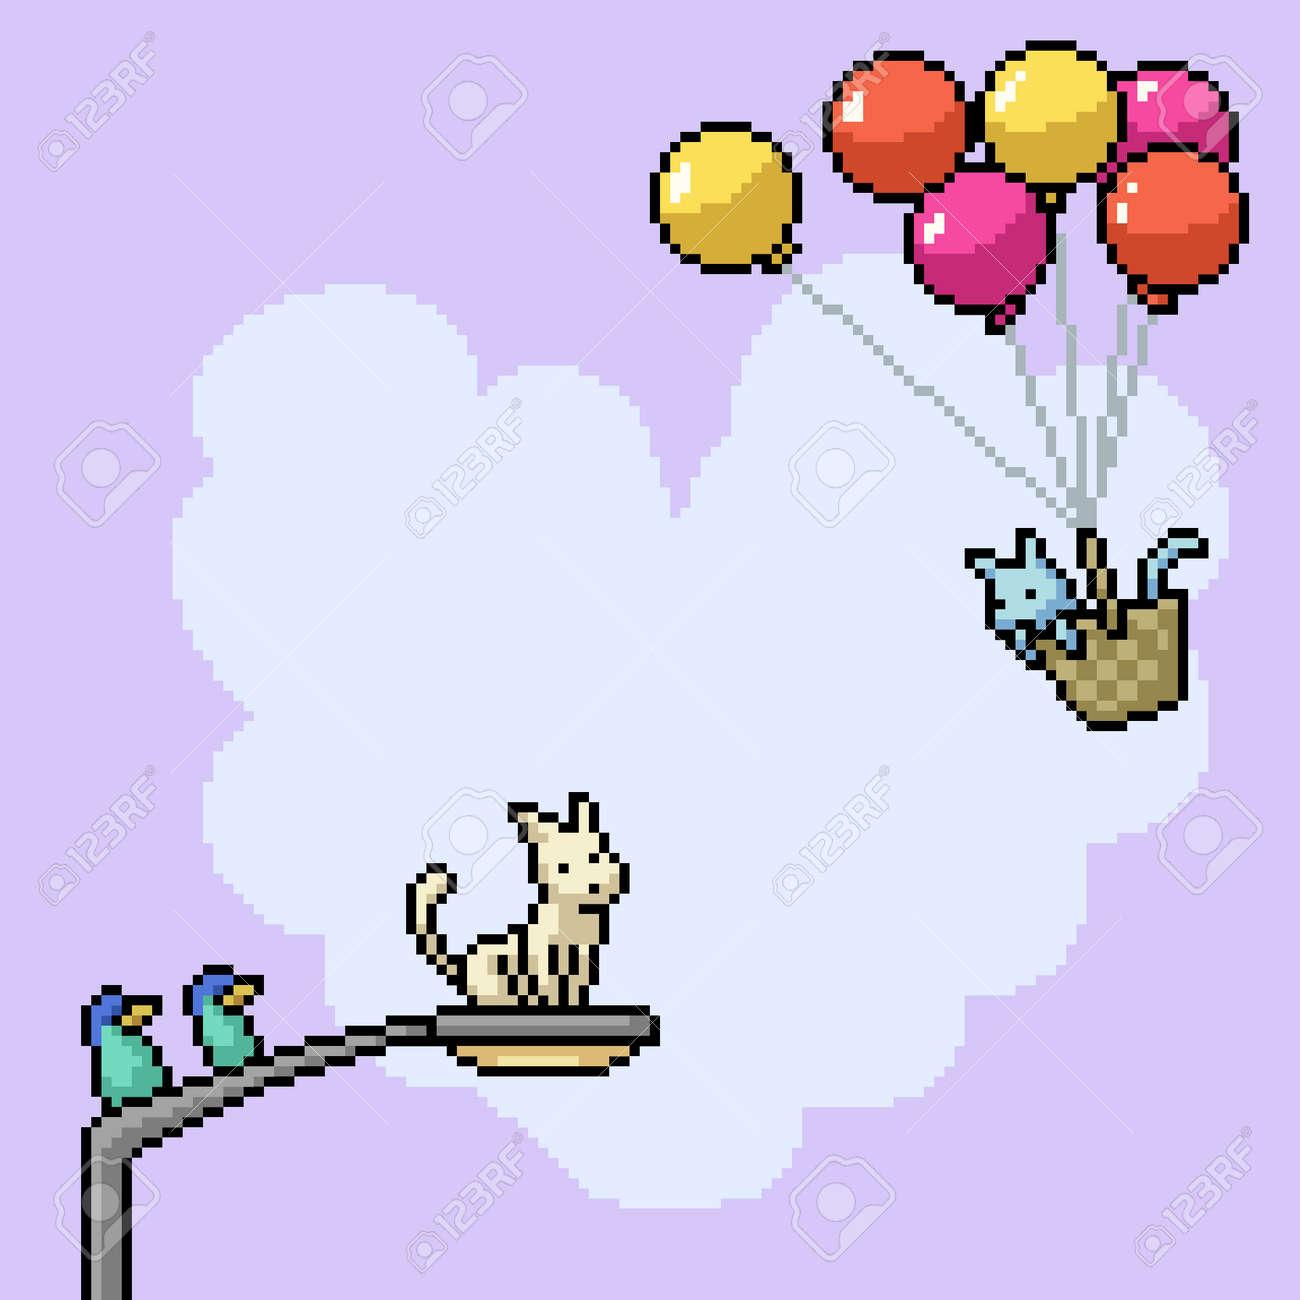 pixel art of romance cat couple - 169551158